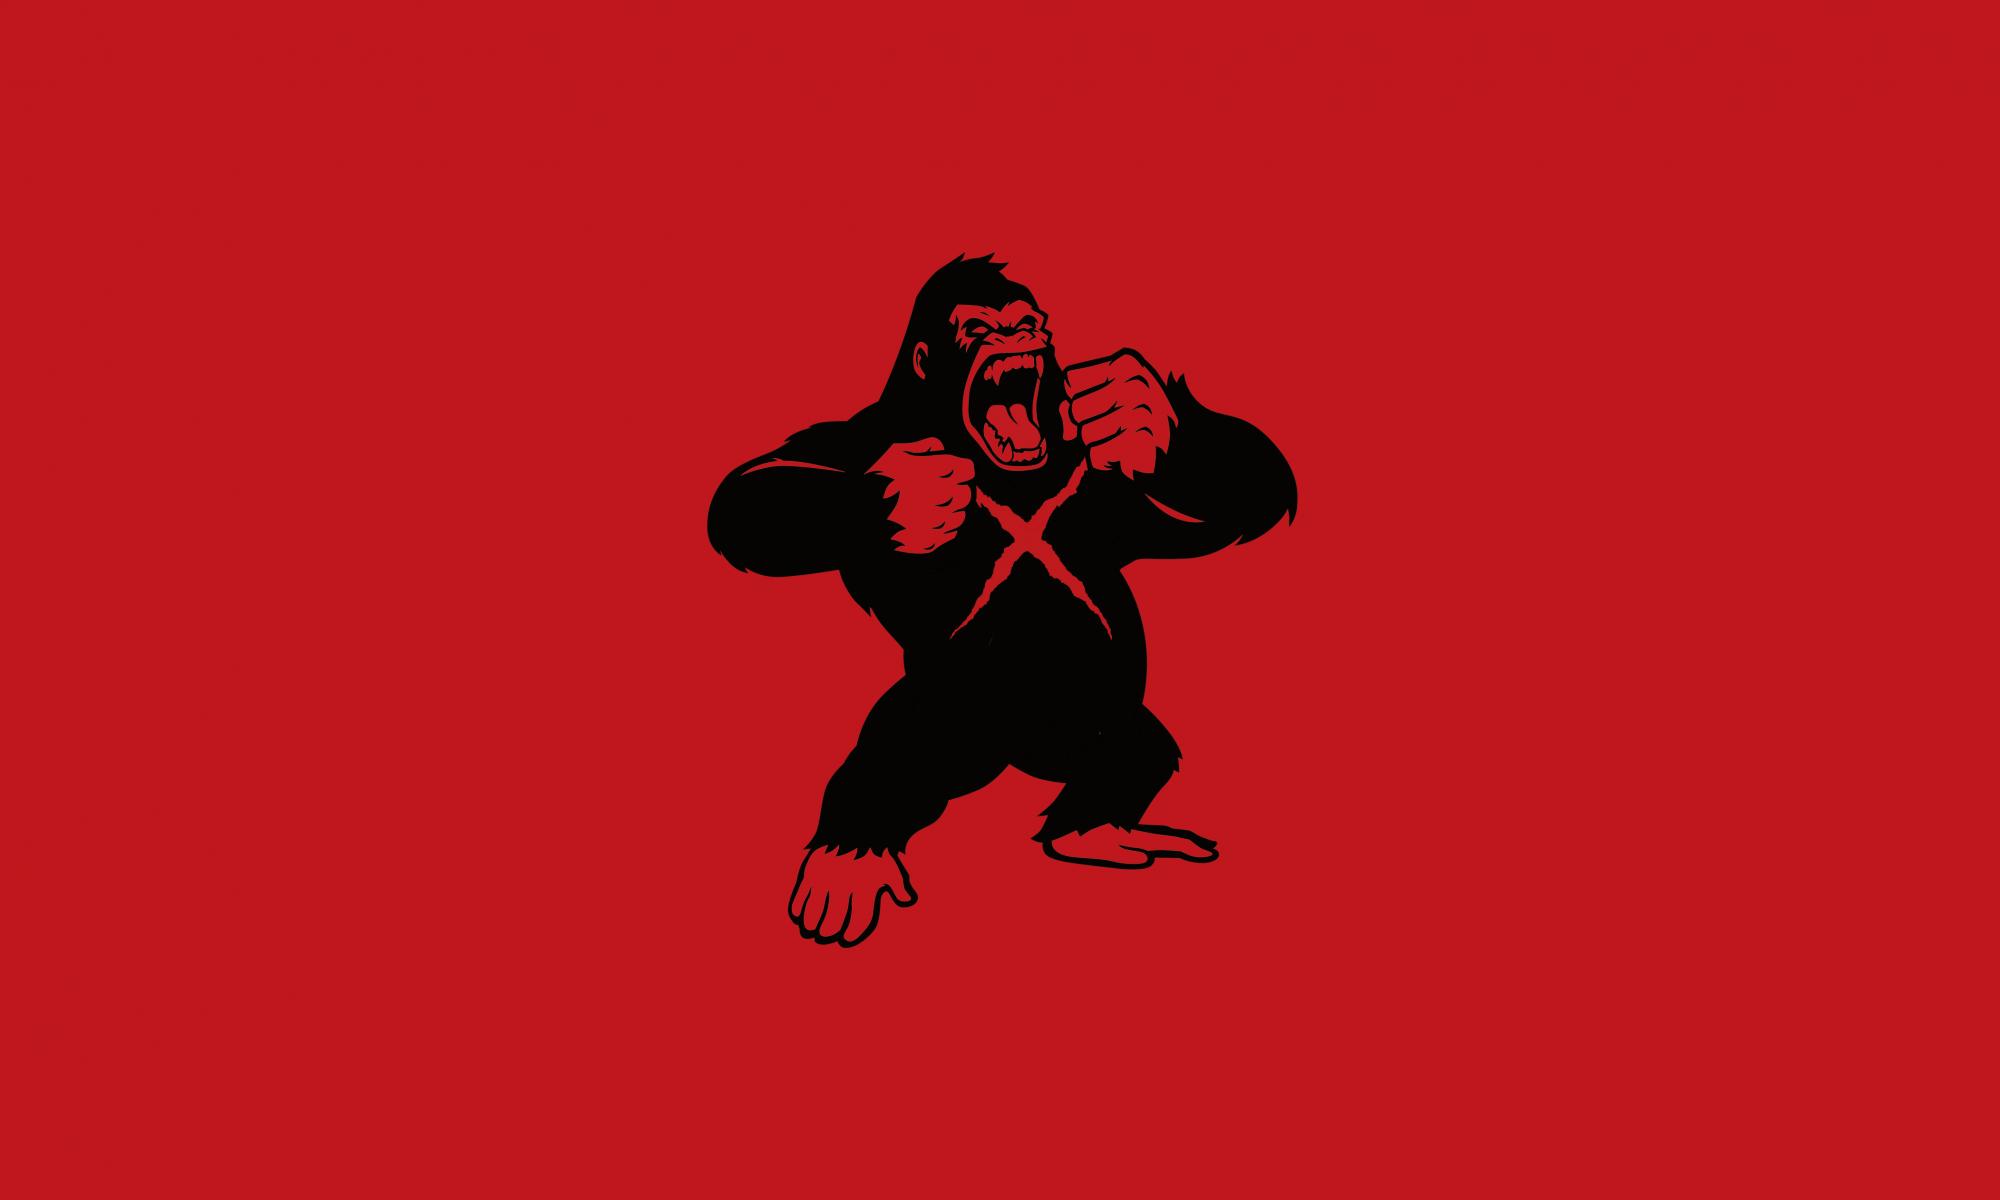 Ape-X Games